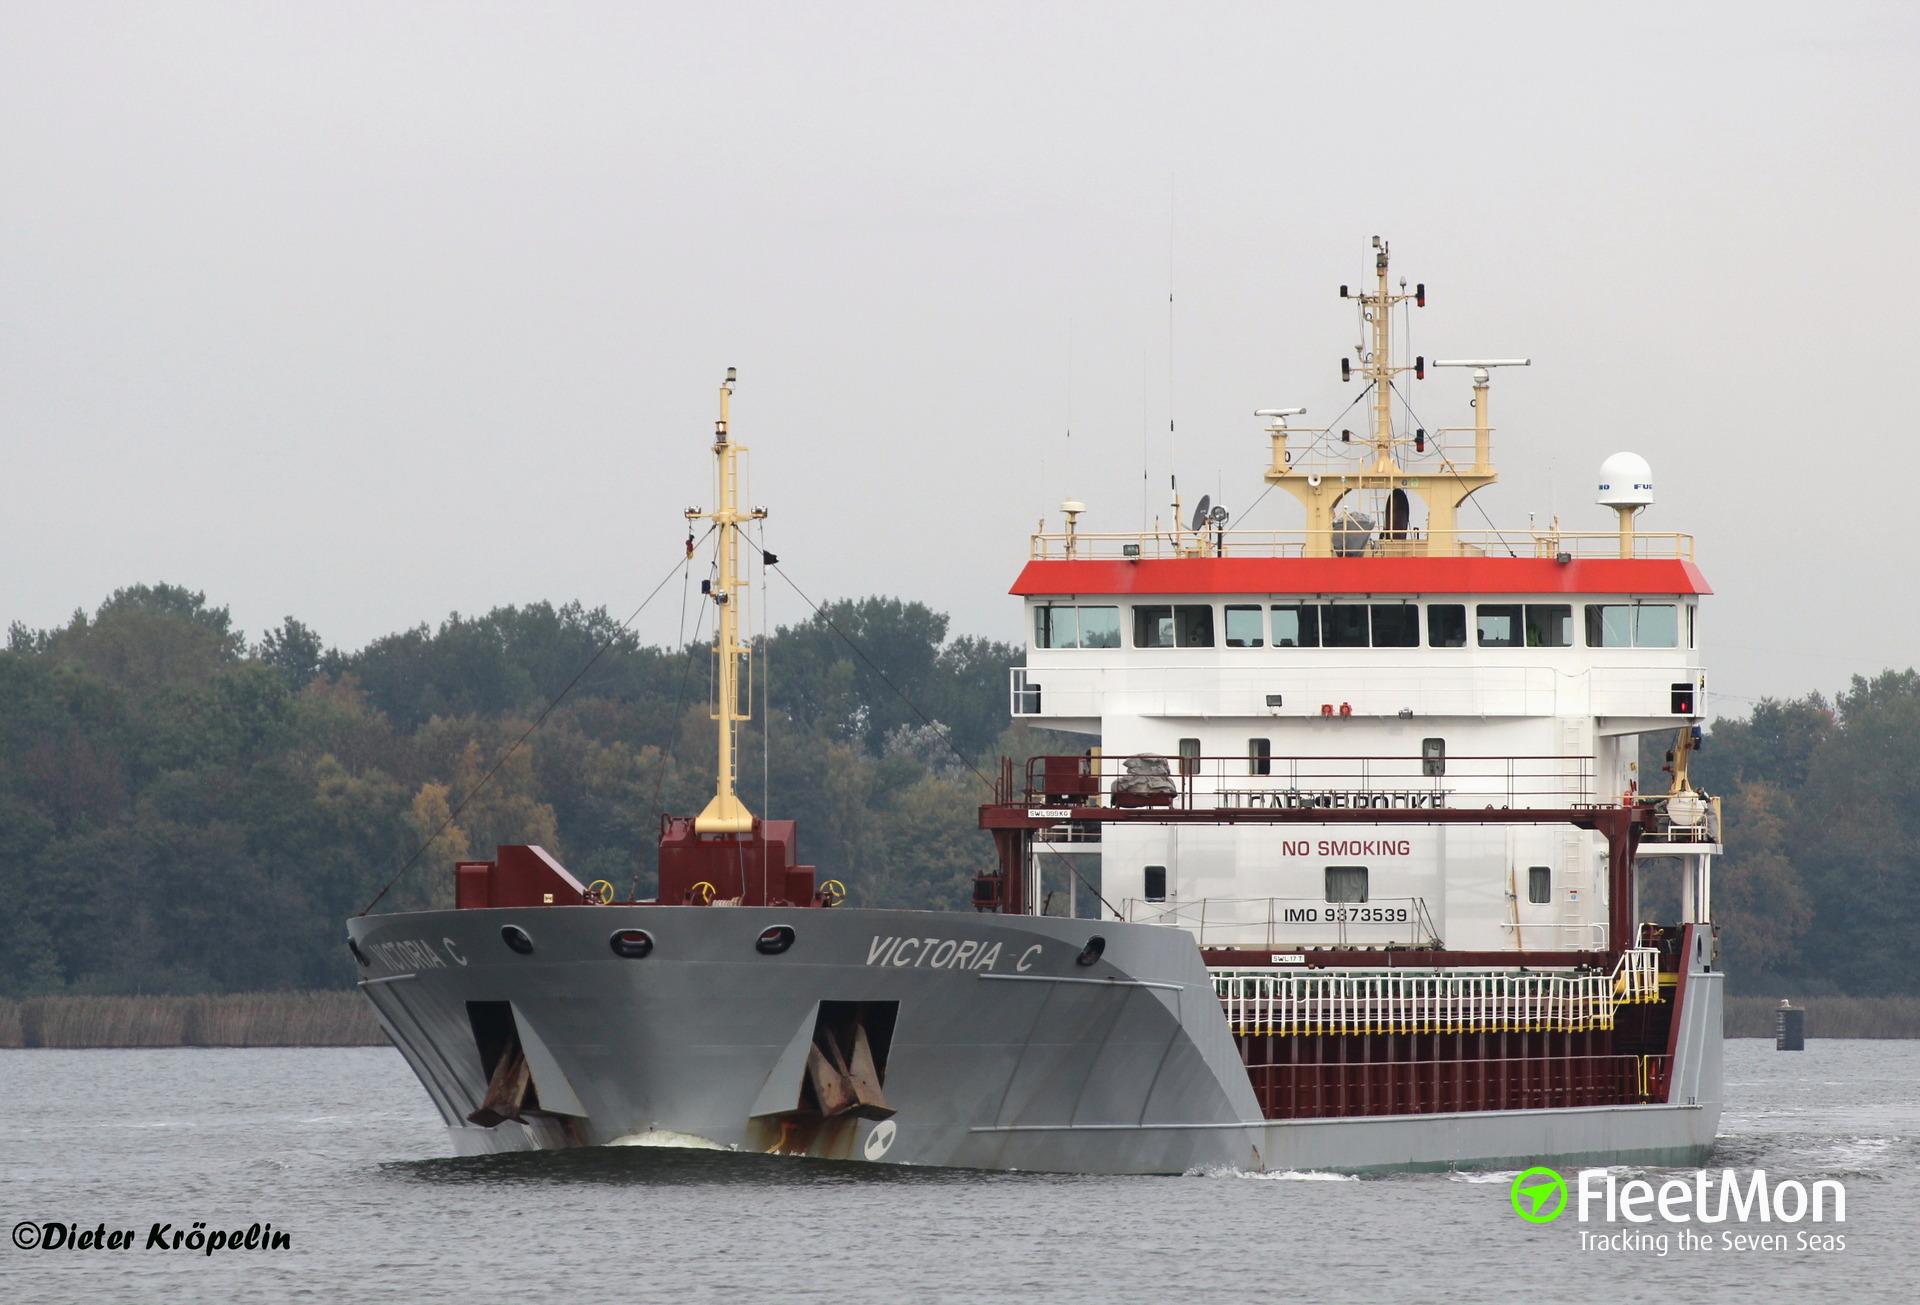 Chief Officer of m/v Victoria C medevaced with wound in abdomen, Kiel Canal